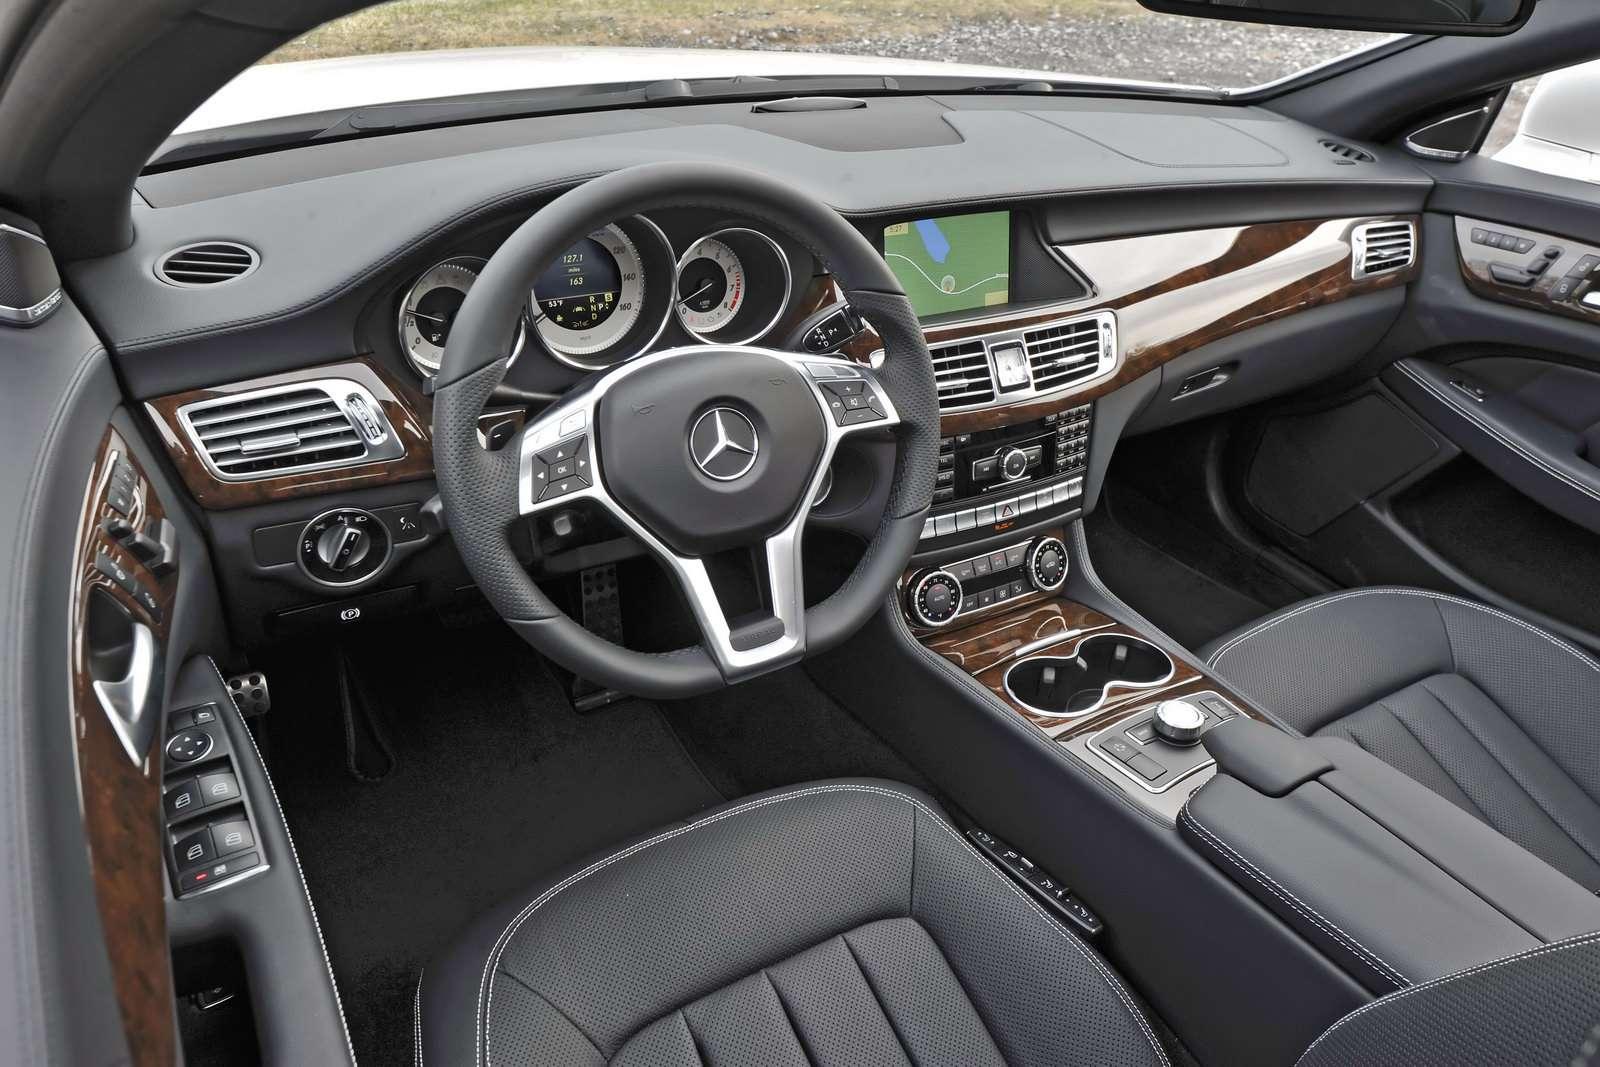 Mercedes-Benz CLS i SLK art ceny usa kwiecien 2011